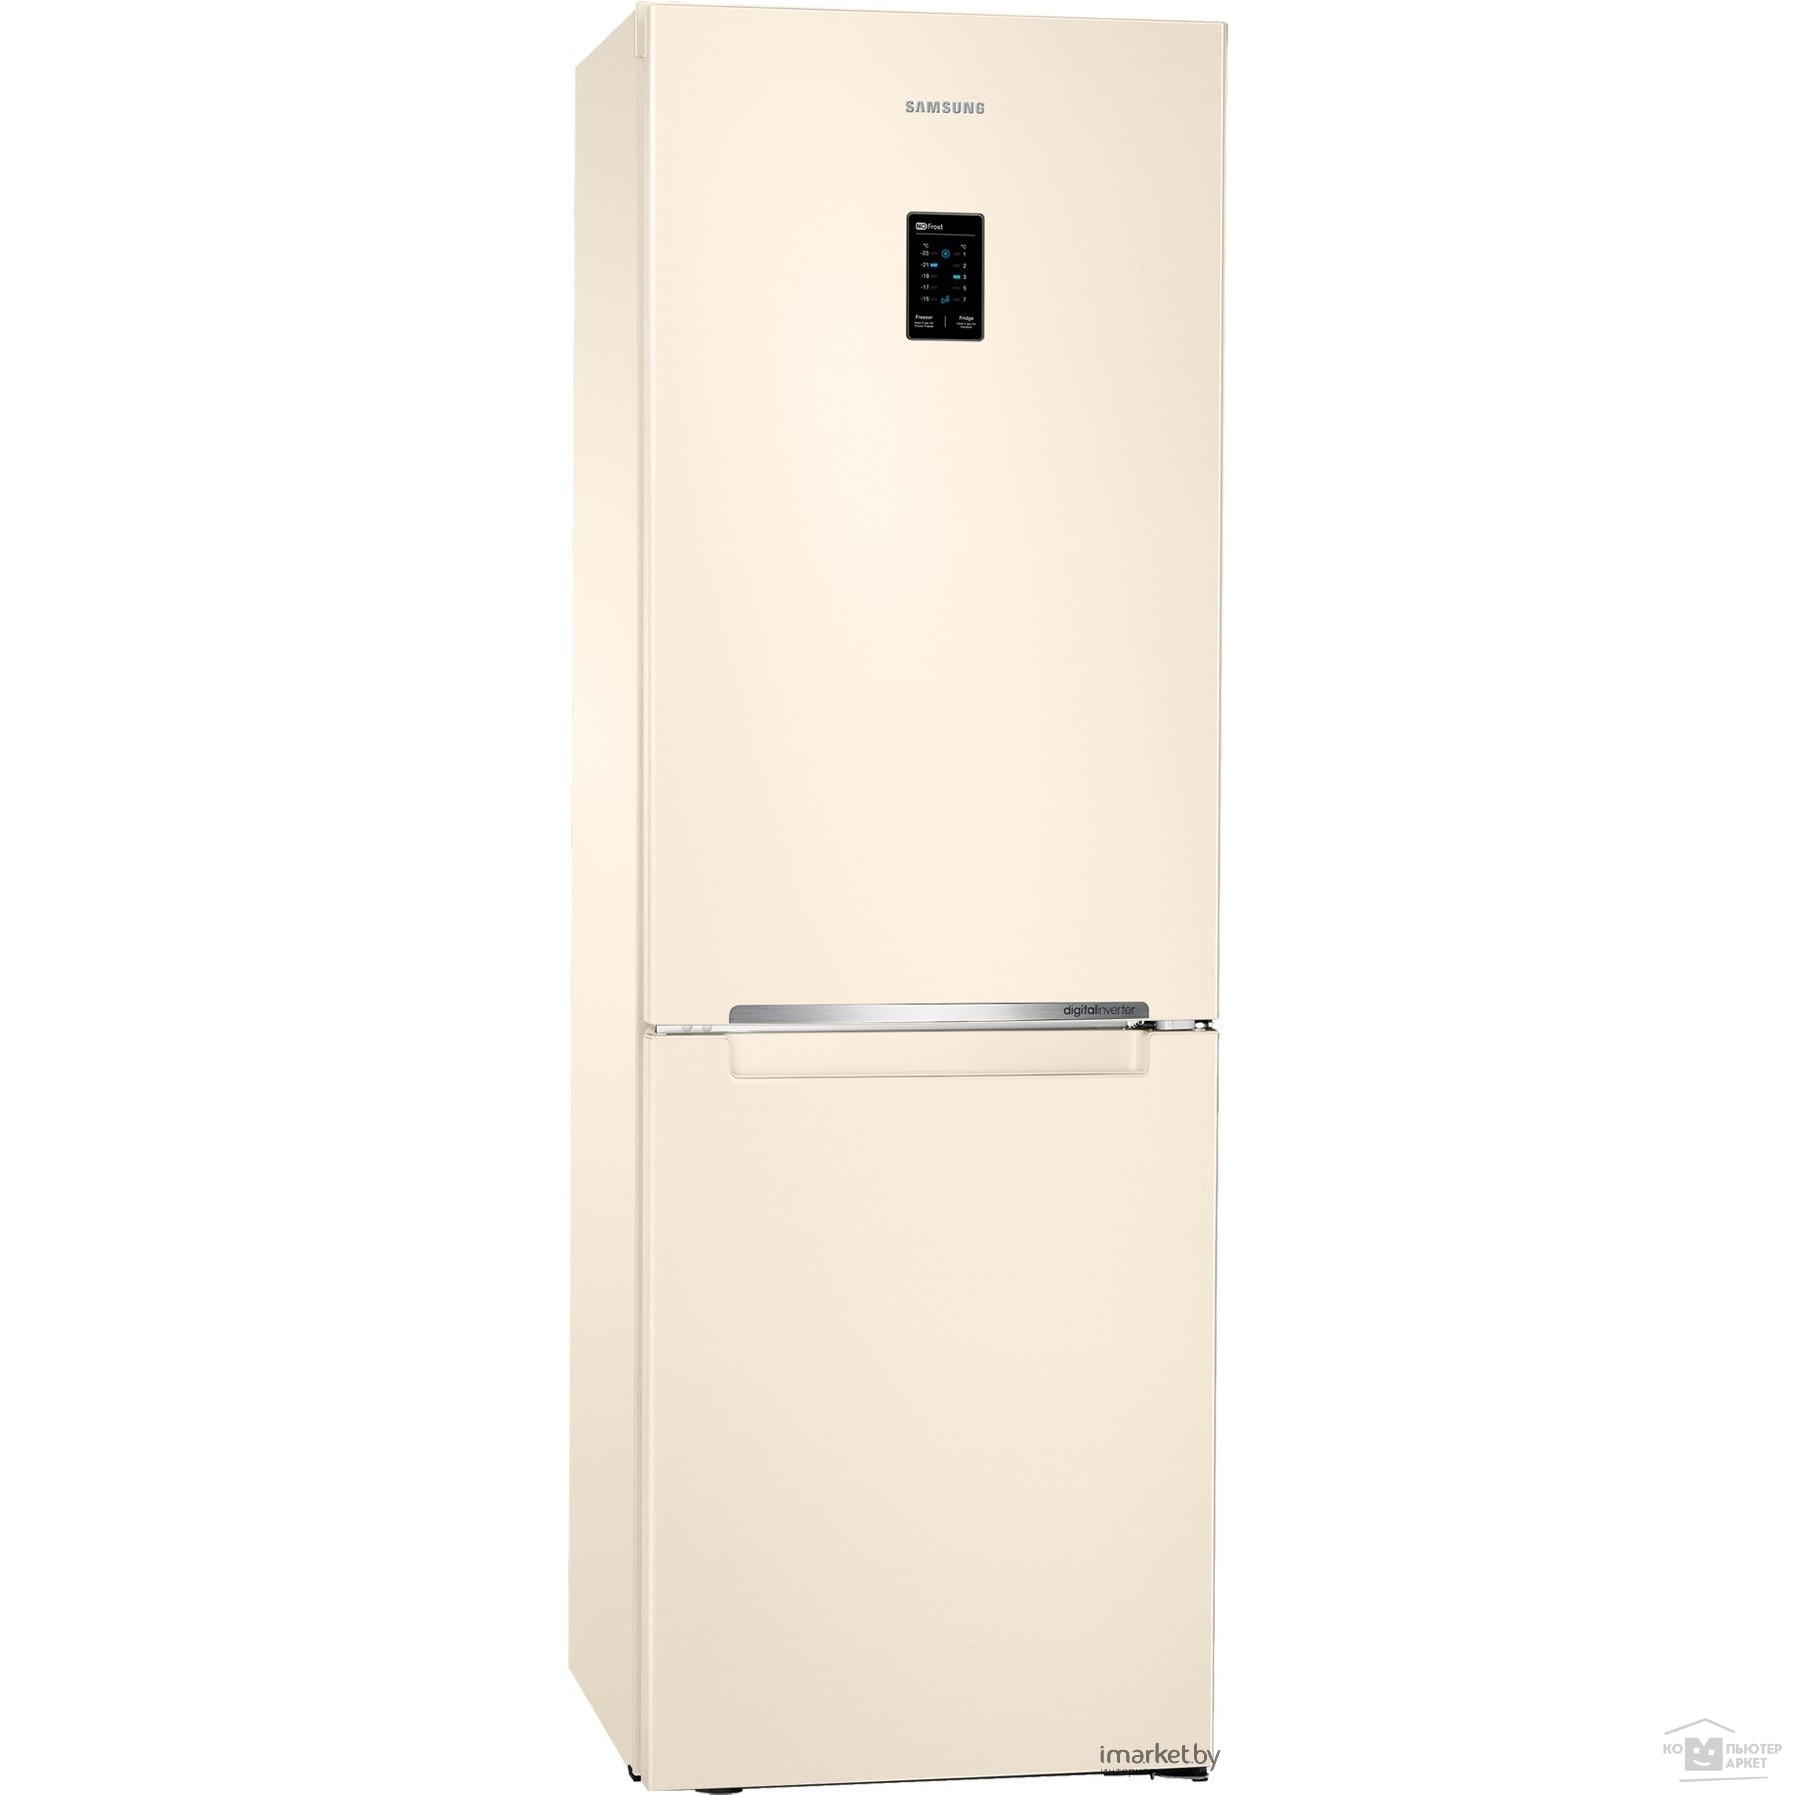 Холодильник Samsung RB30A32N0EL/WT бежевый (двухкамерный)/Samsung RB30A32N0EL/WT RB30A32N0EL/WT